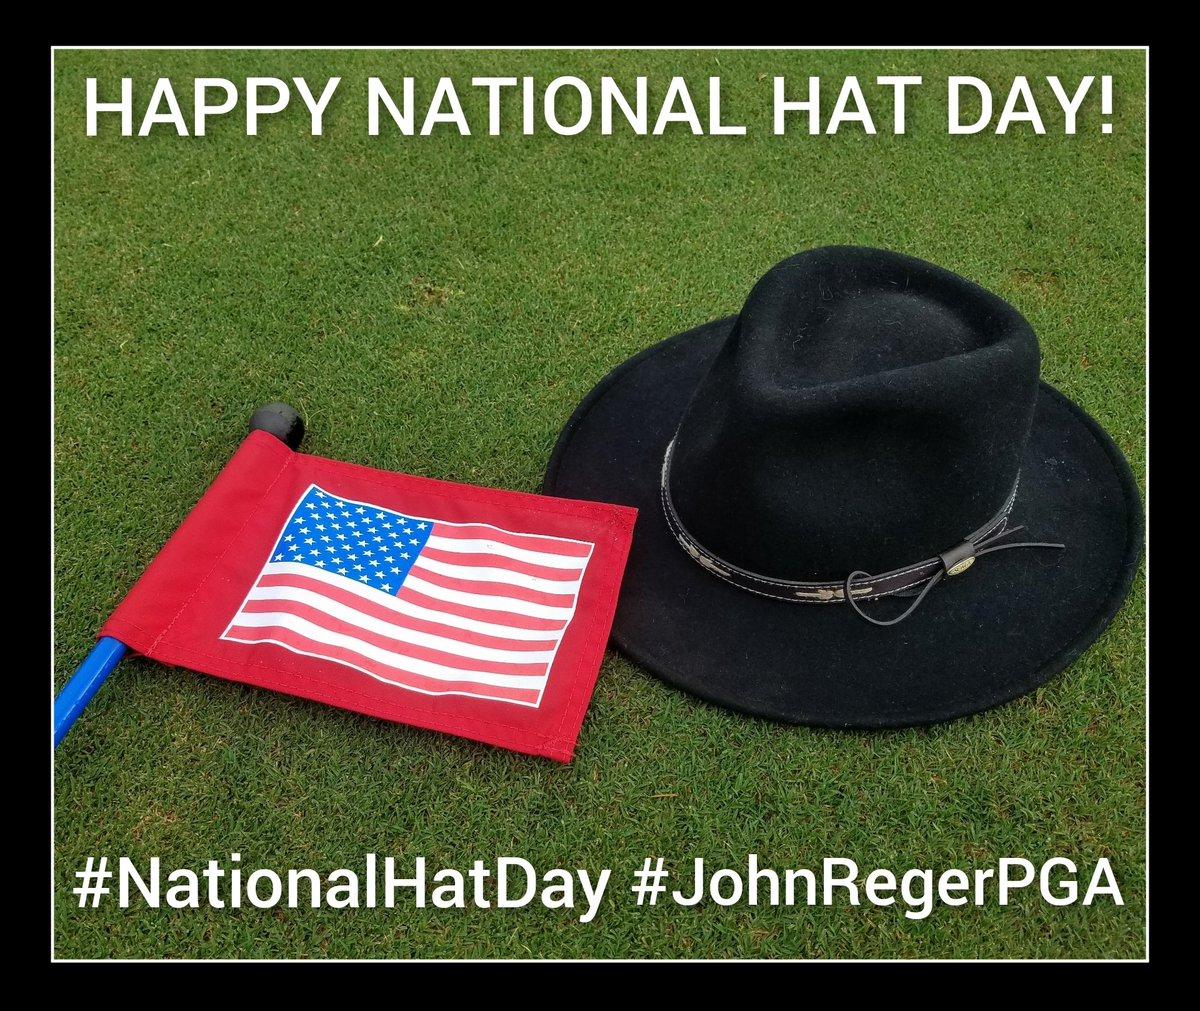 Happy National Hat Day! #NationalHatDay #JohnRegerPGA #meadowbrookgolfclubgainesville